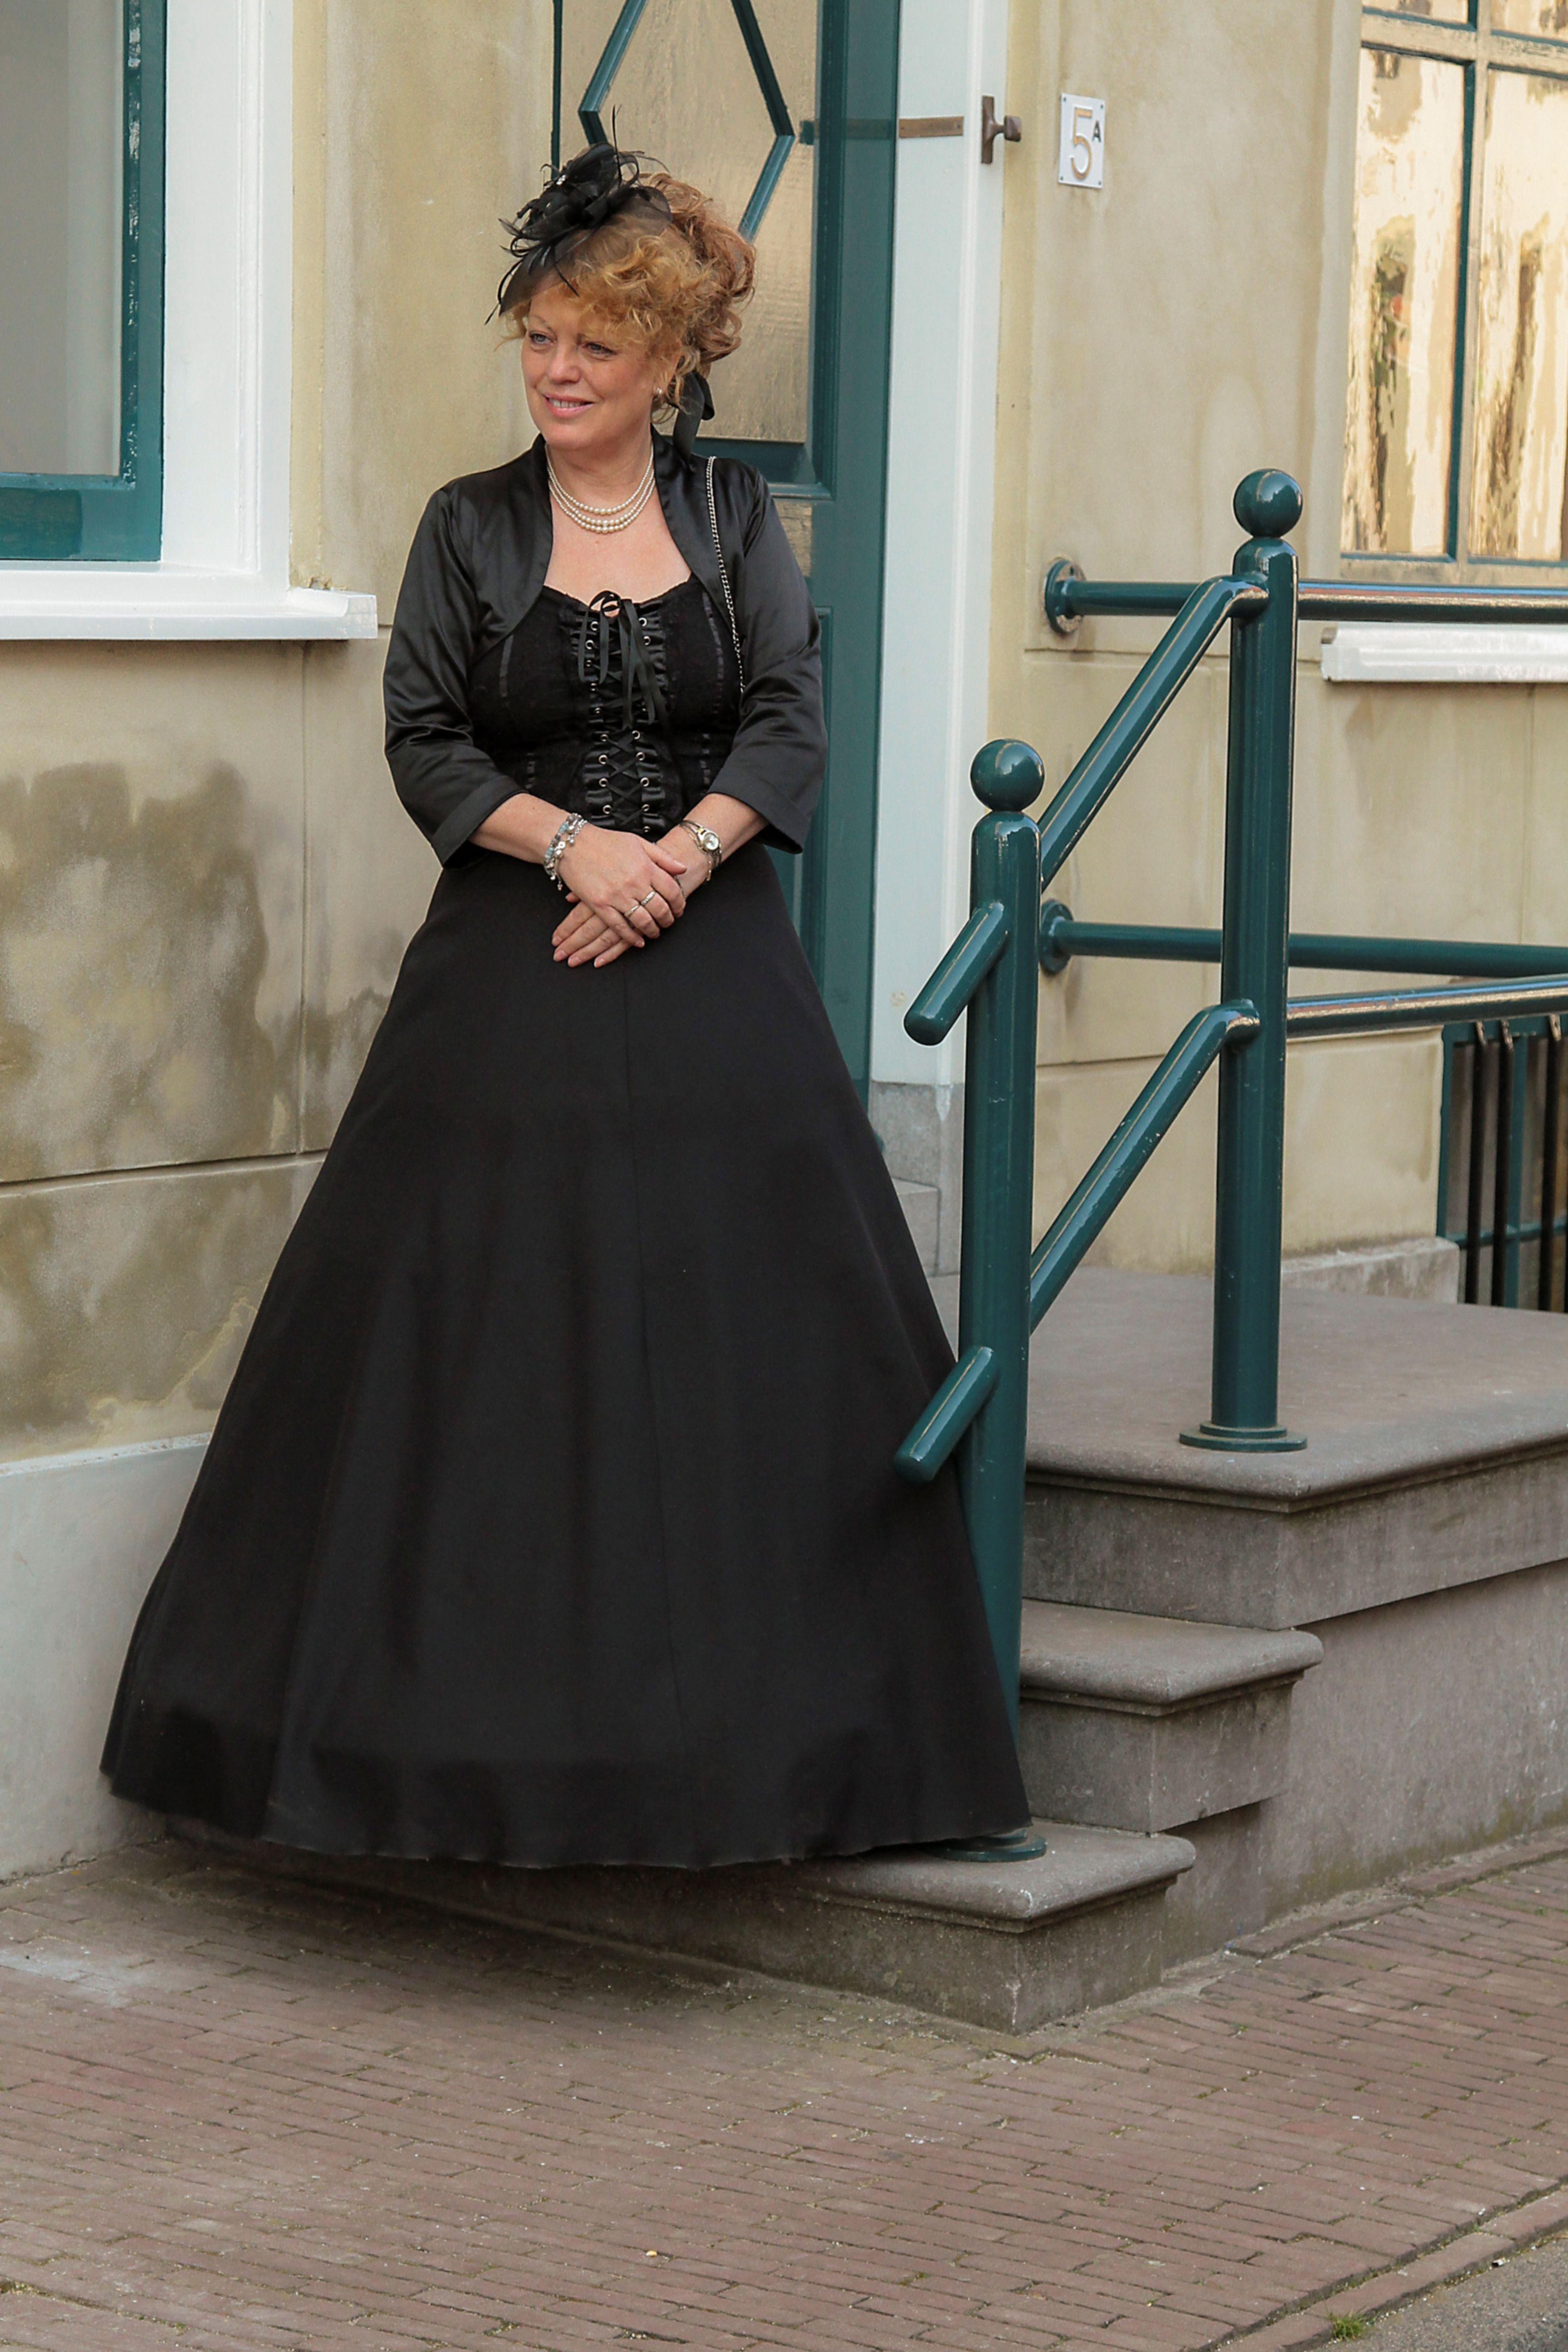 fotos gratis   mujer  antiguo  modelo  primavera  moda